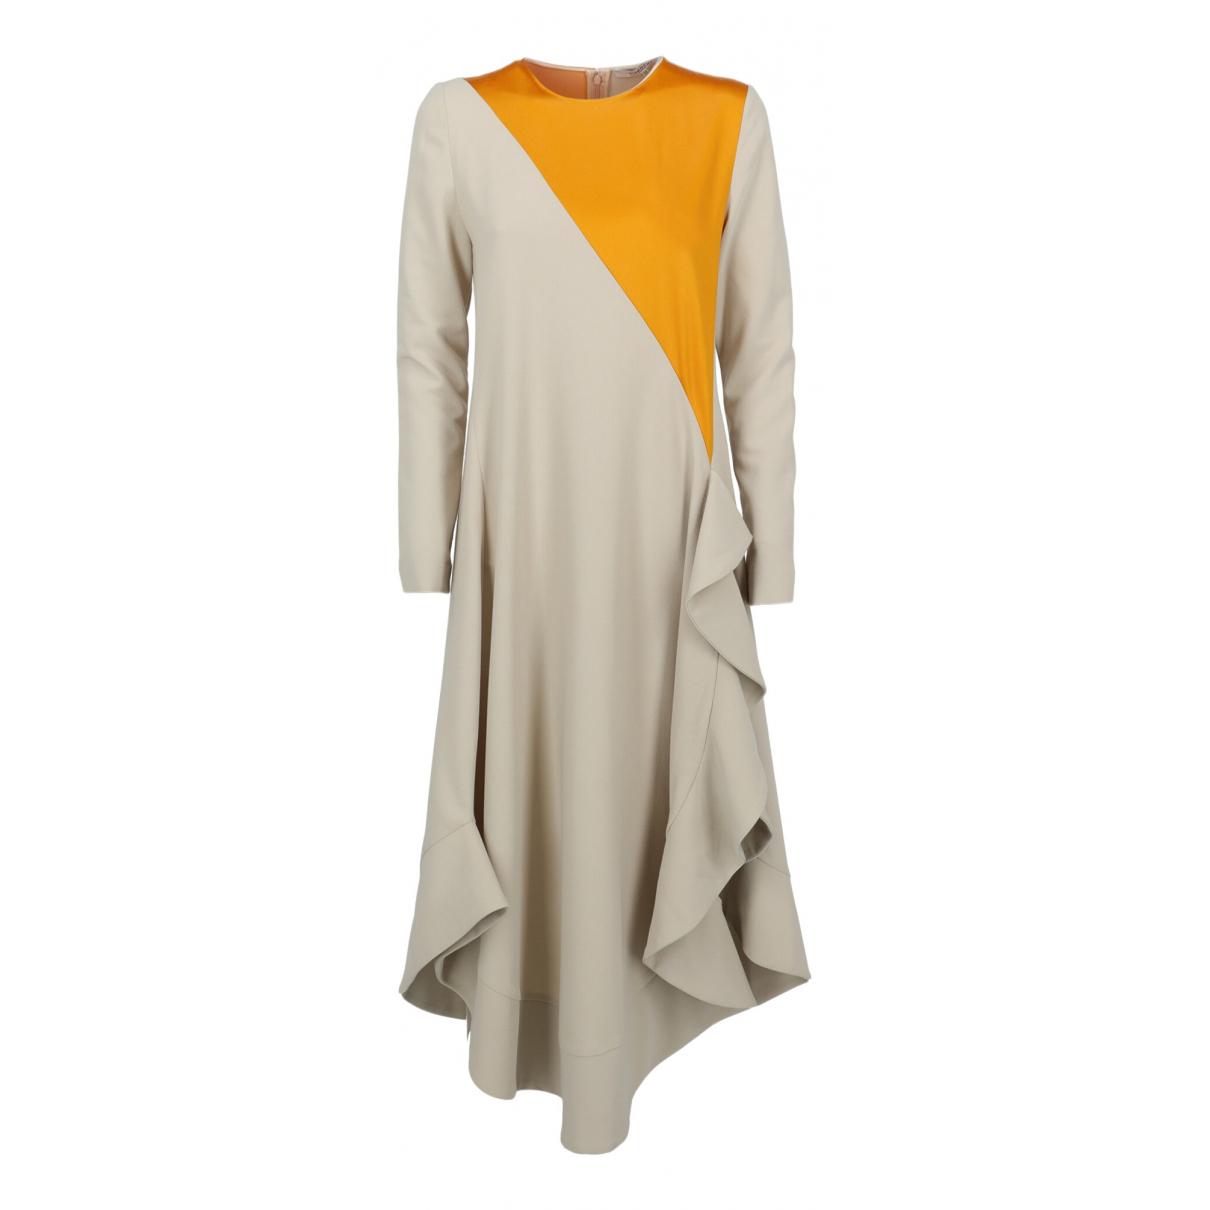 Givenchy \N Kleid in  Beige Baumwolle